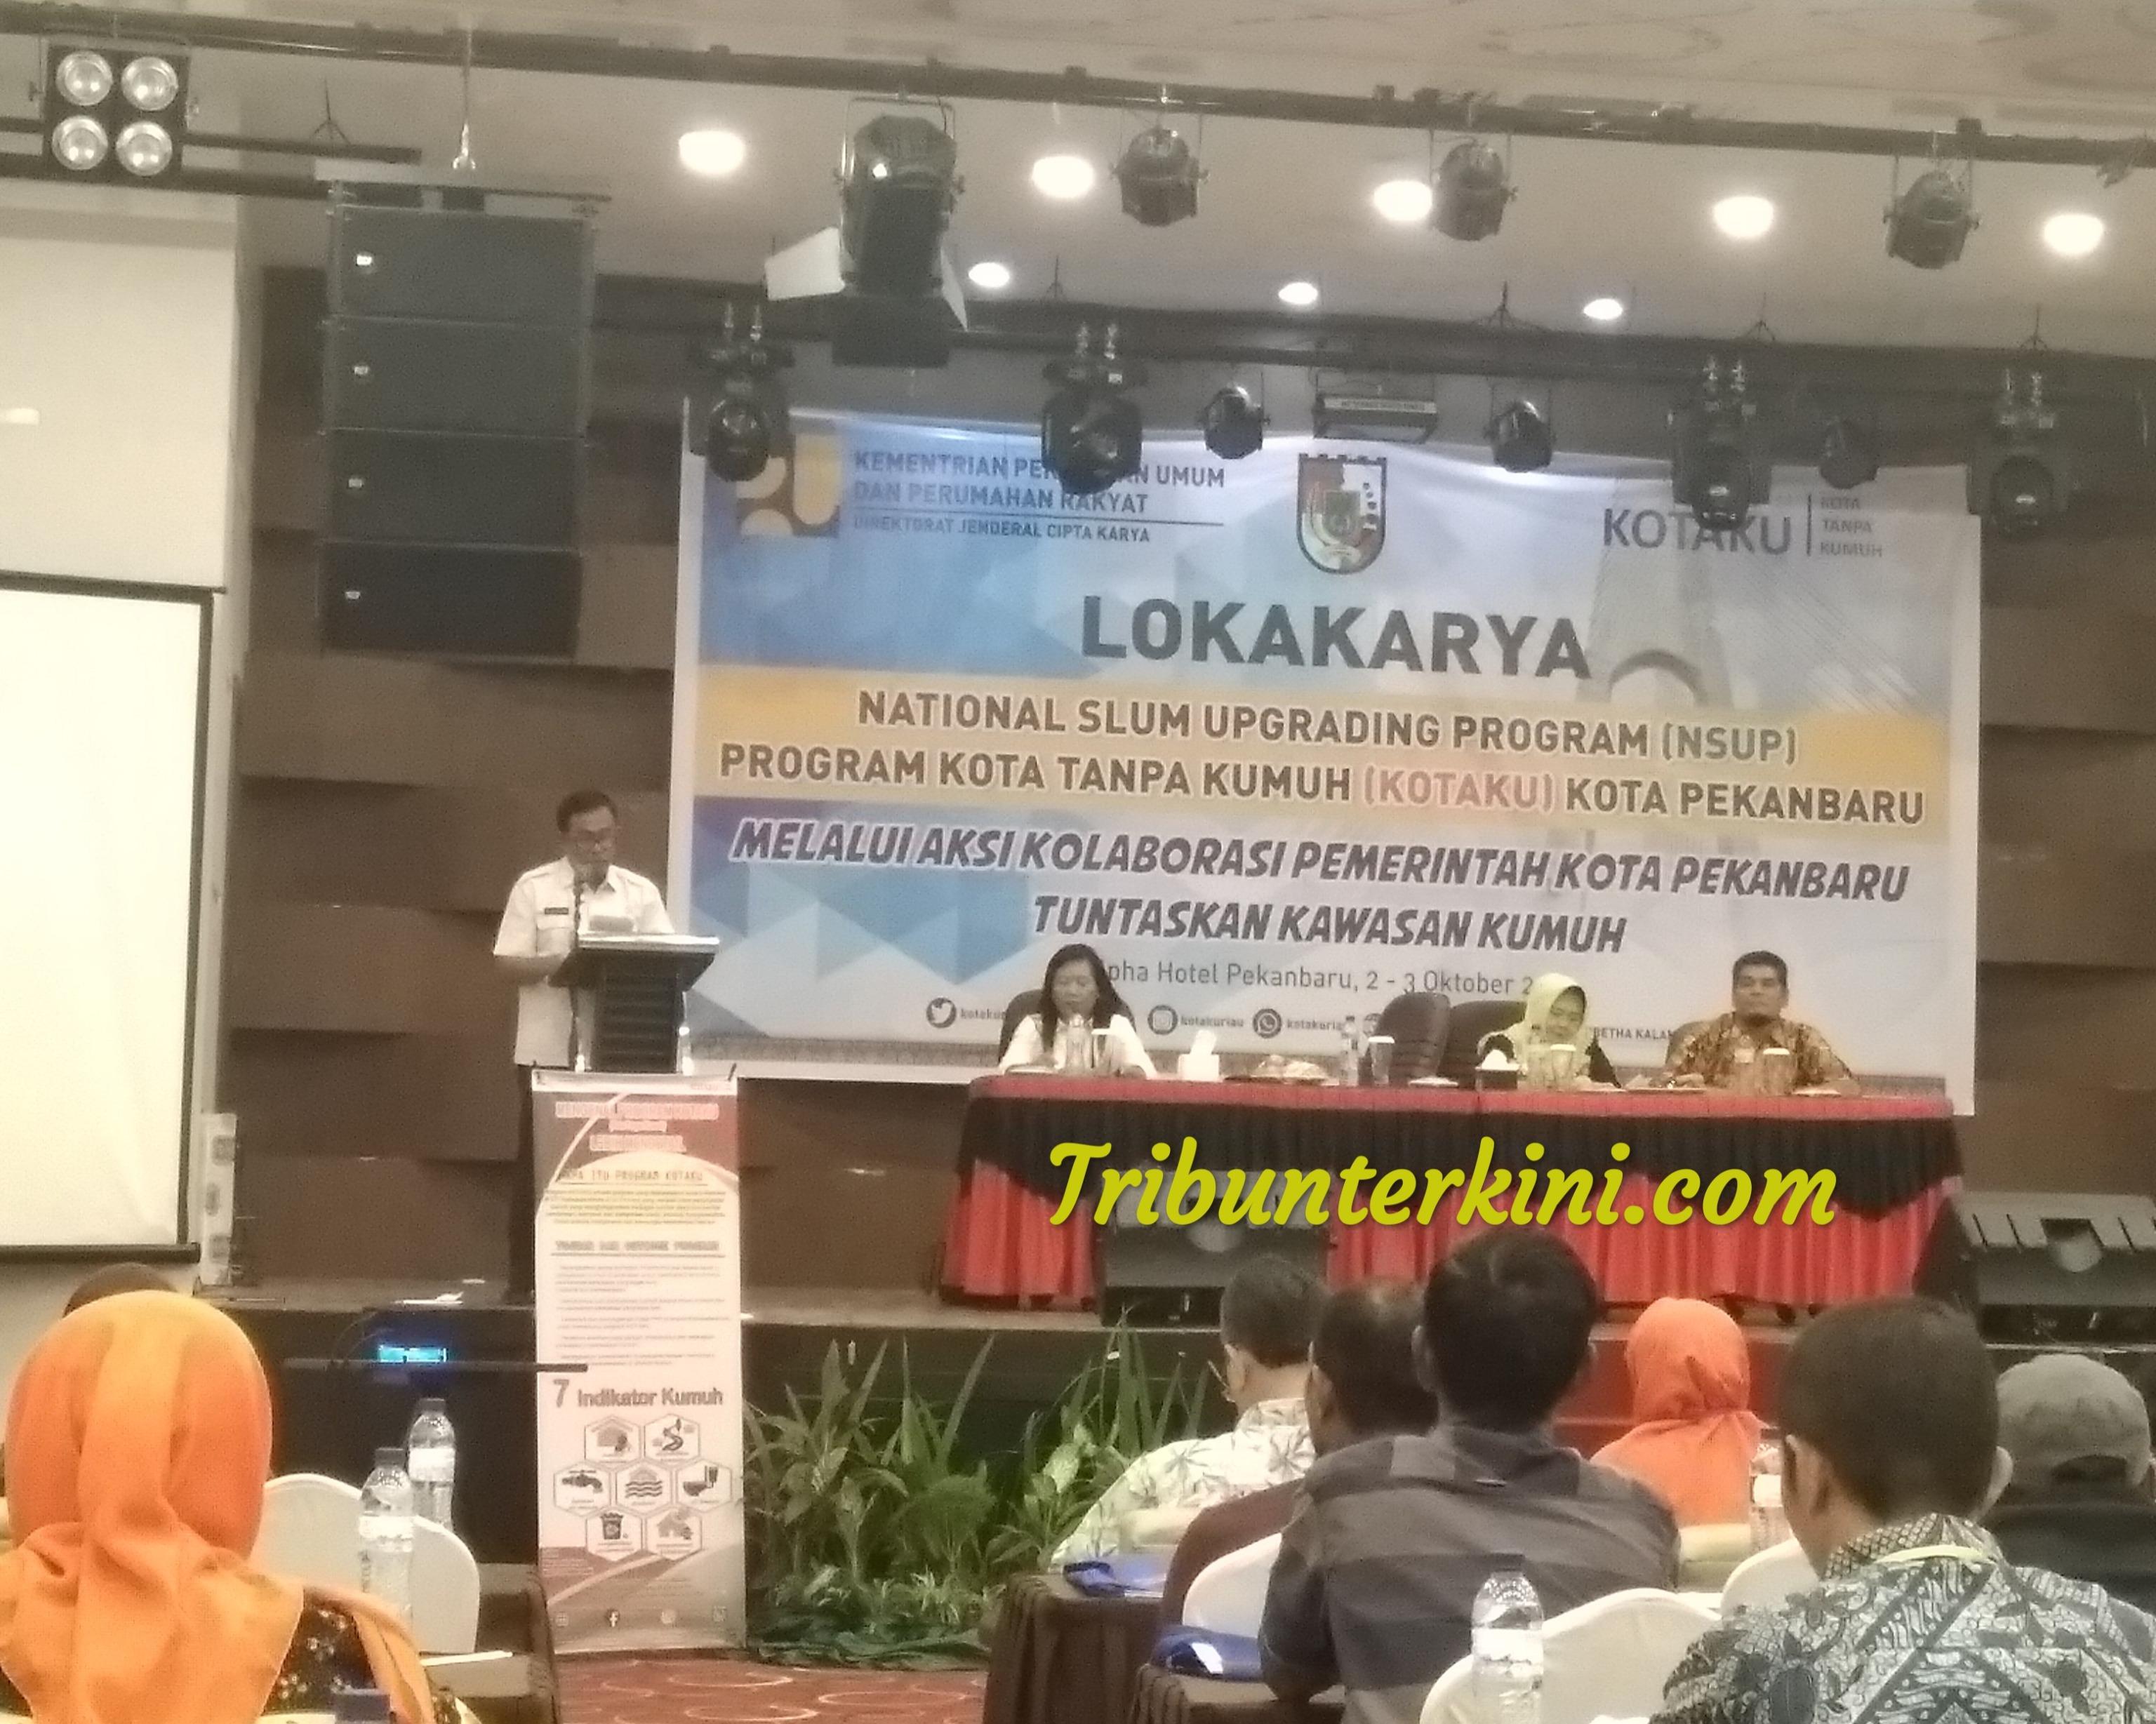 Dinas Perumahan Rakyat dan Kawasan Permukiman Pekanbaru Laksanakan Lokakarya NSUP Program Kota Tanpa Kumuh (Kotaku) Kota Pekanbaru